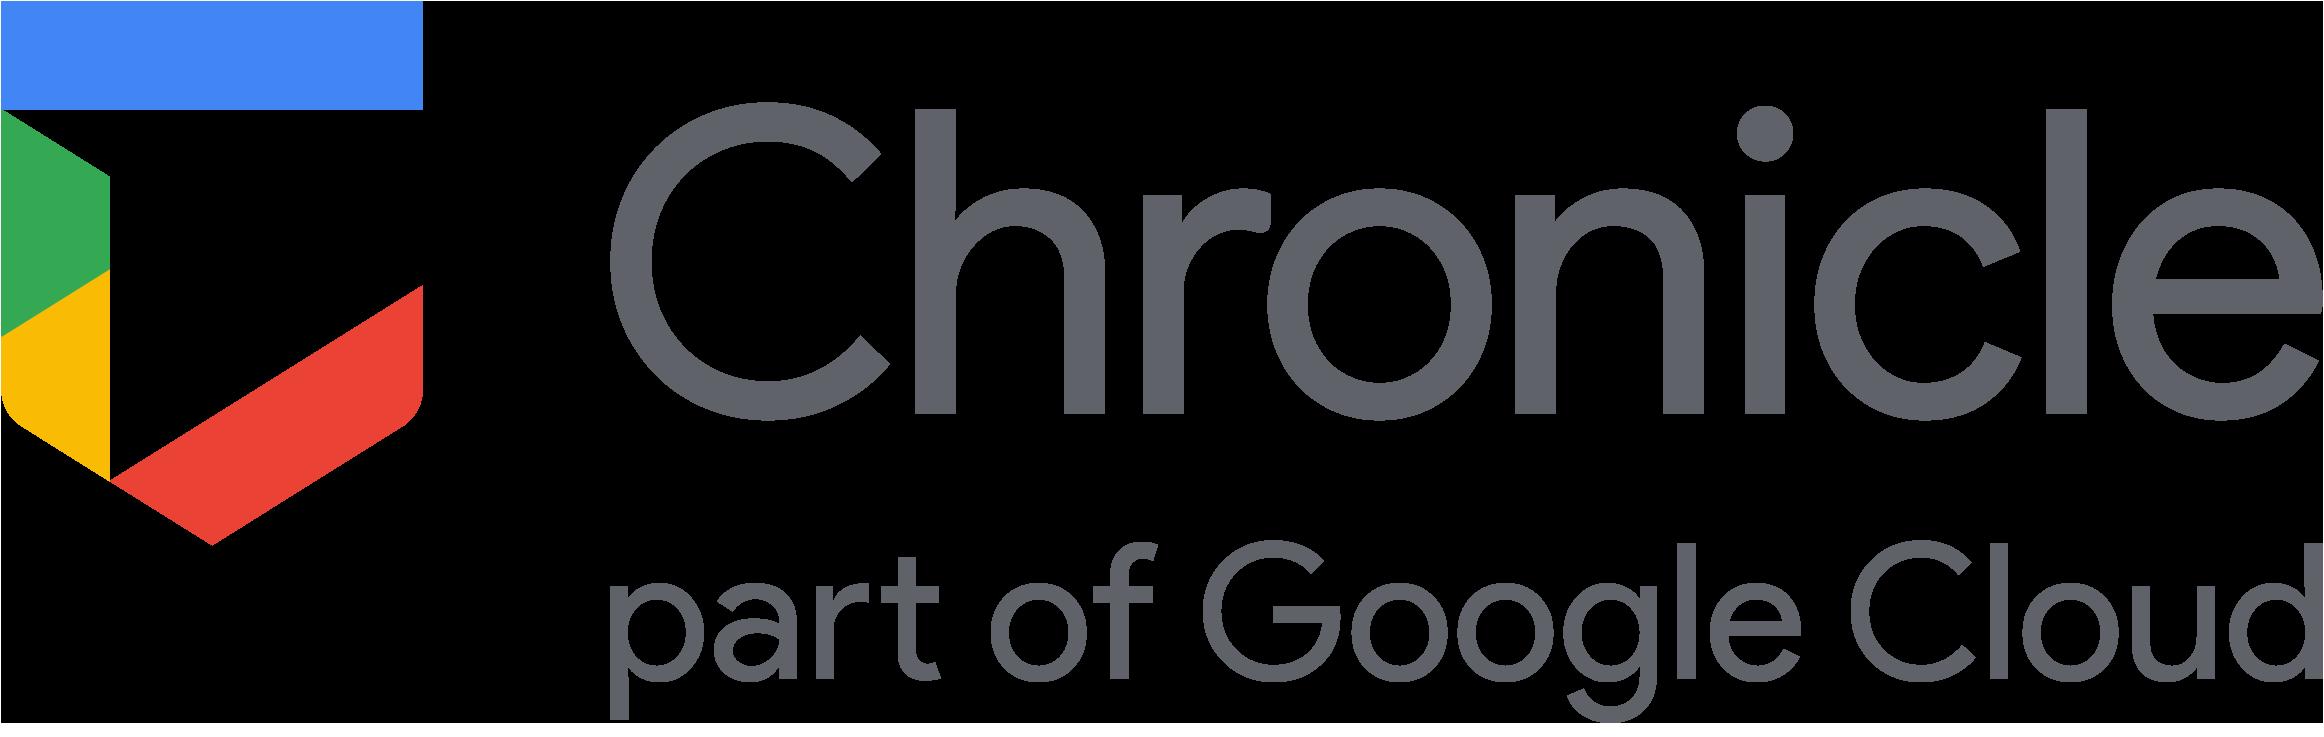 Google Chronicle